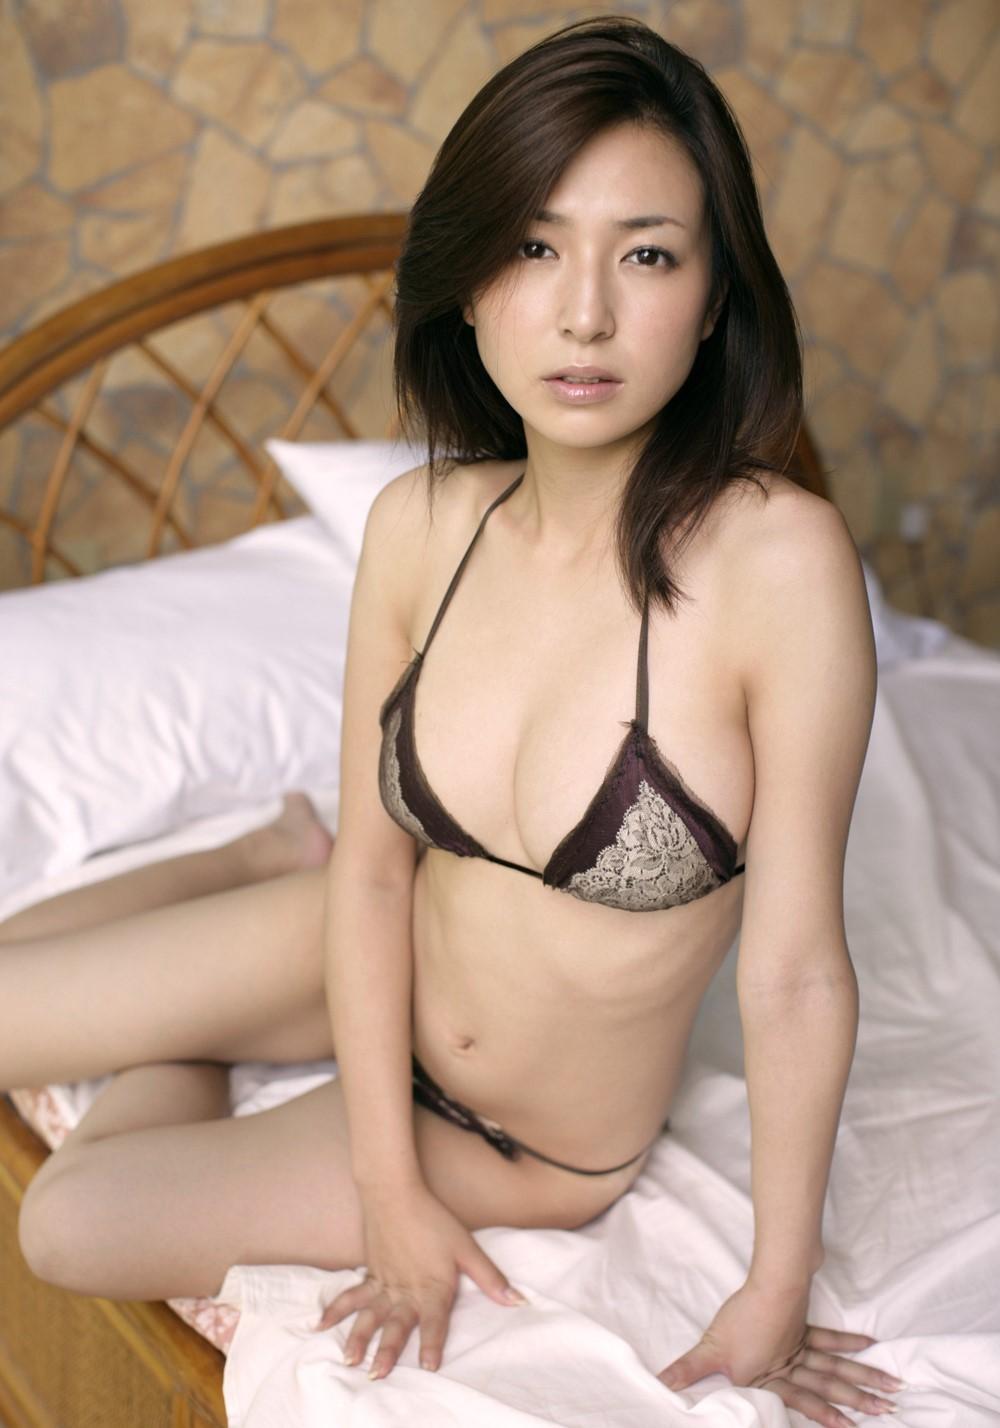 Sexy desnudo chino chicas ducha